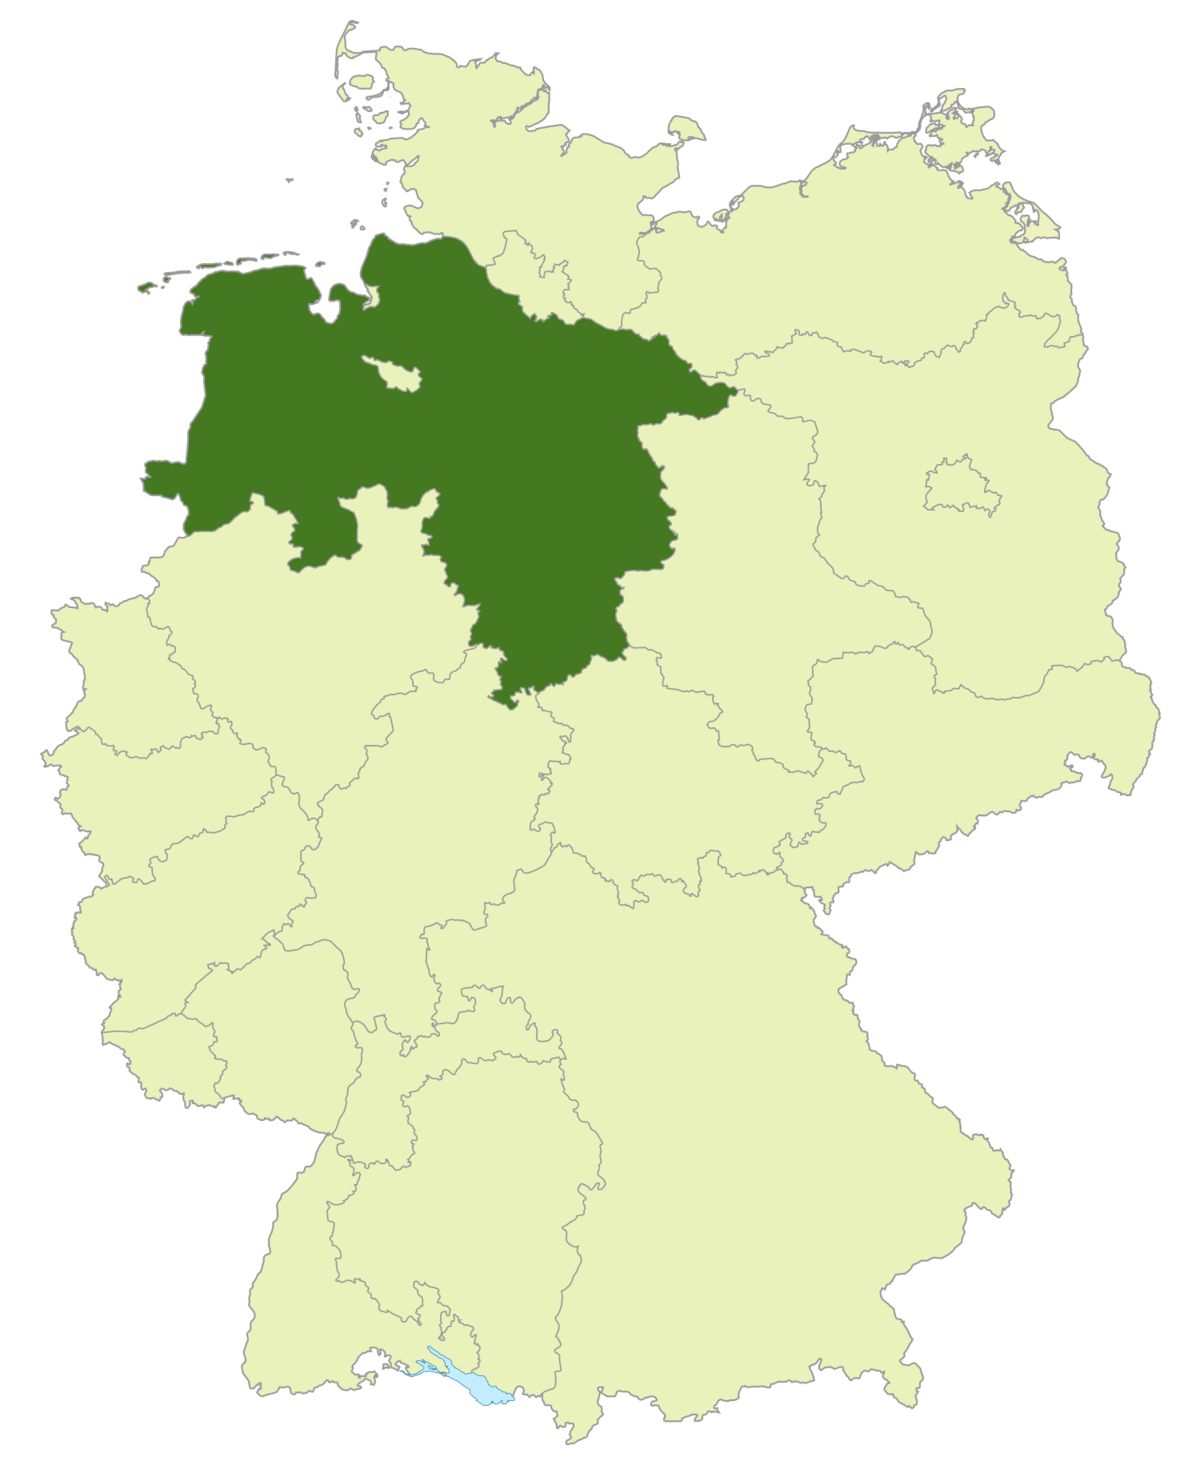 Oberliga Niedersachsen - Wikipedia